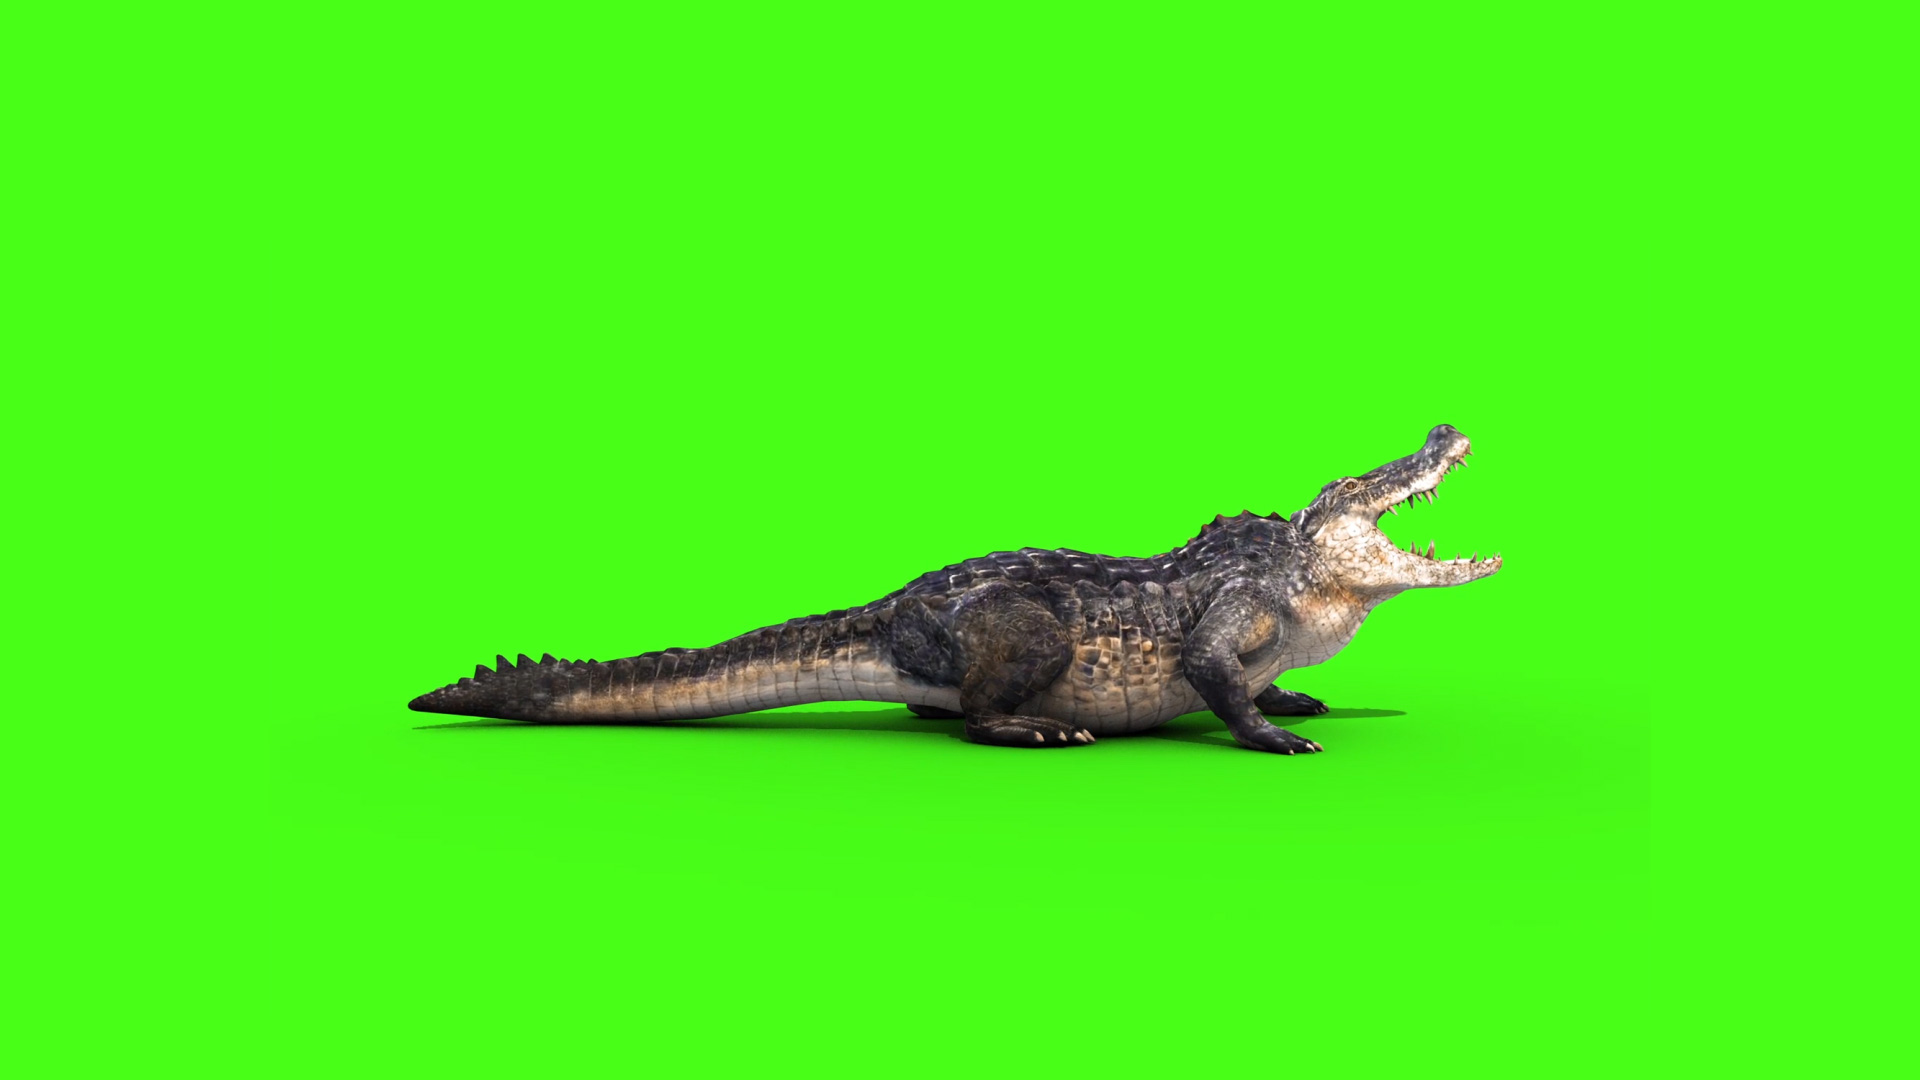 alligator crocodile 3d model animated pixelboom